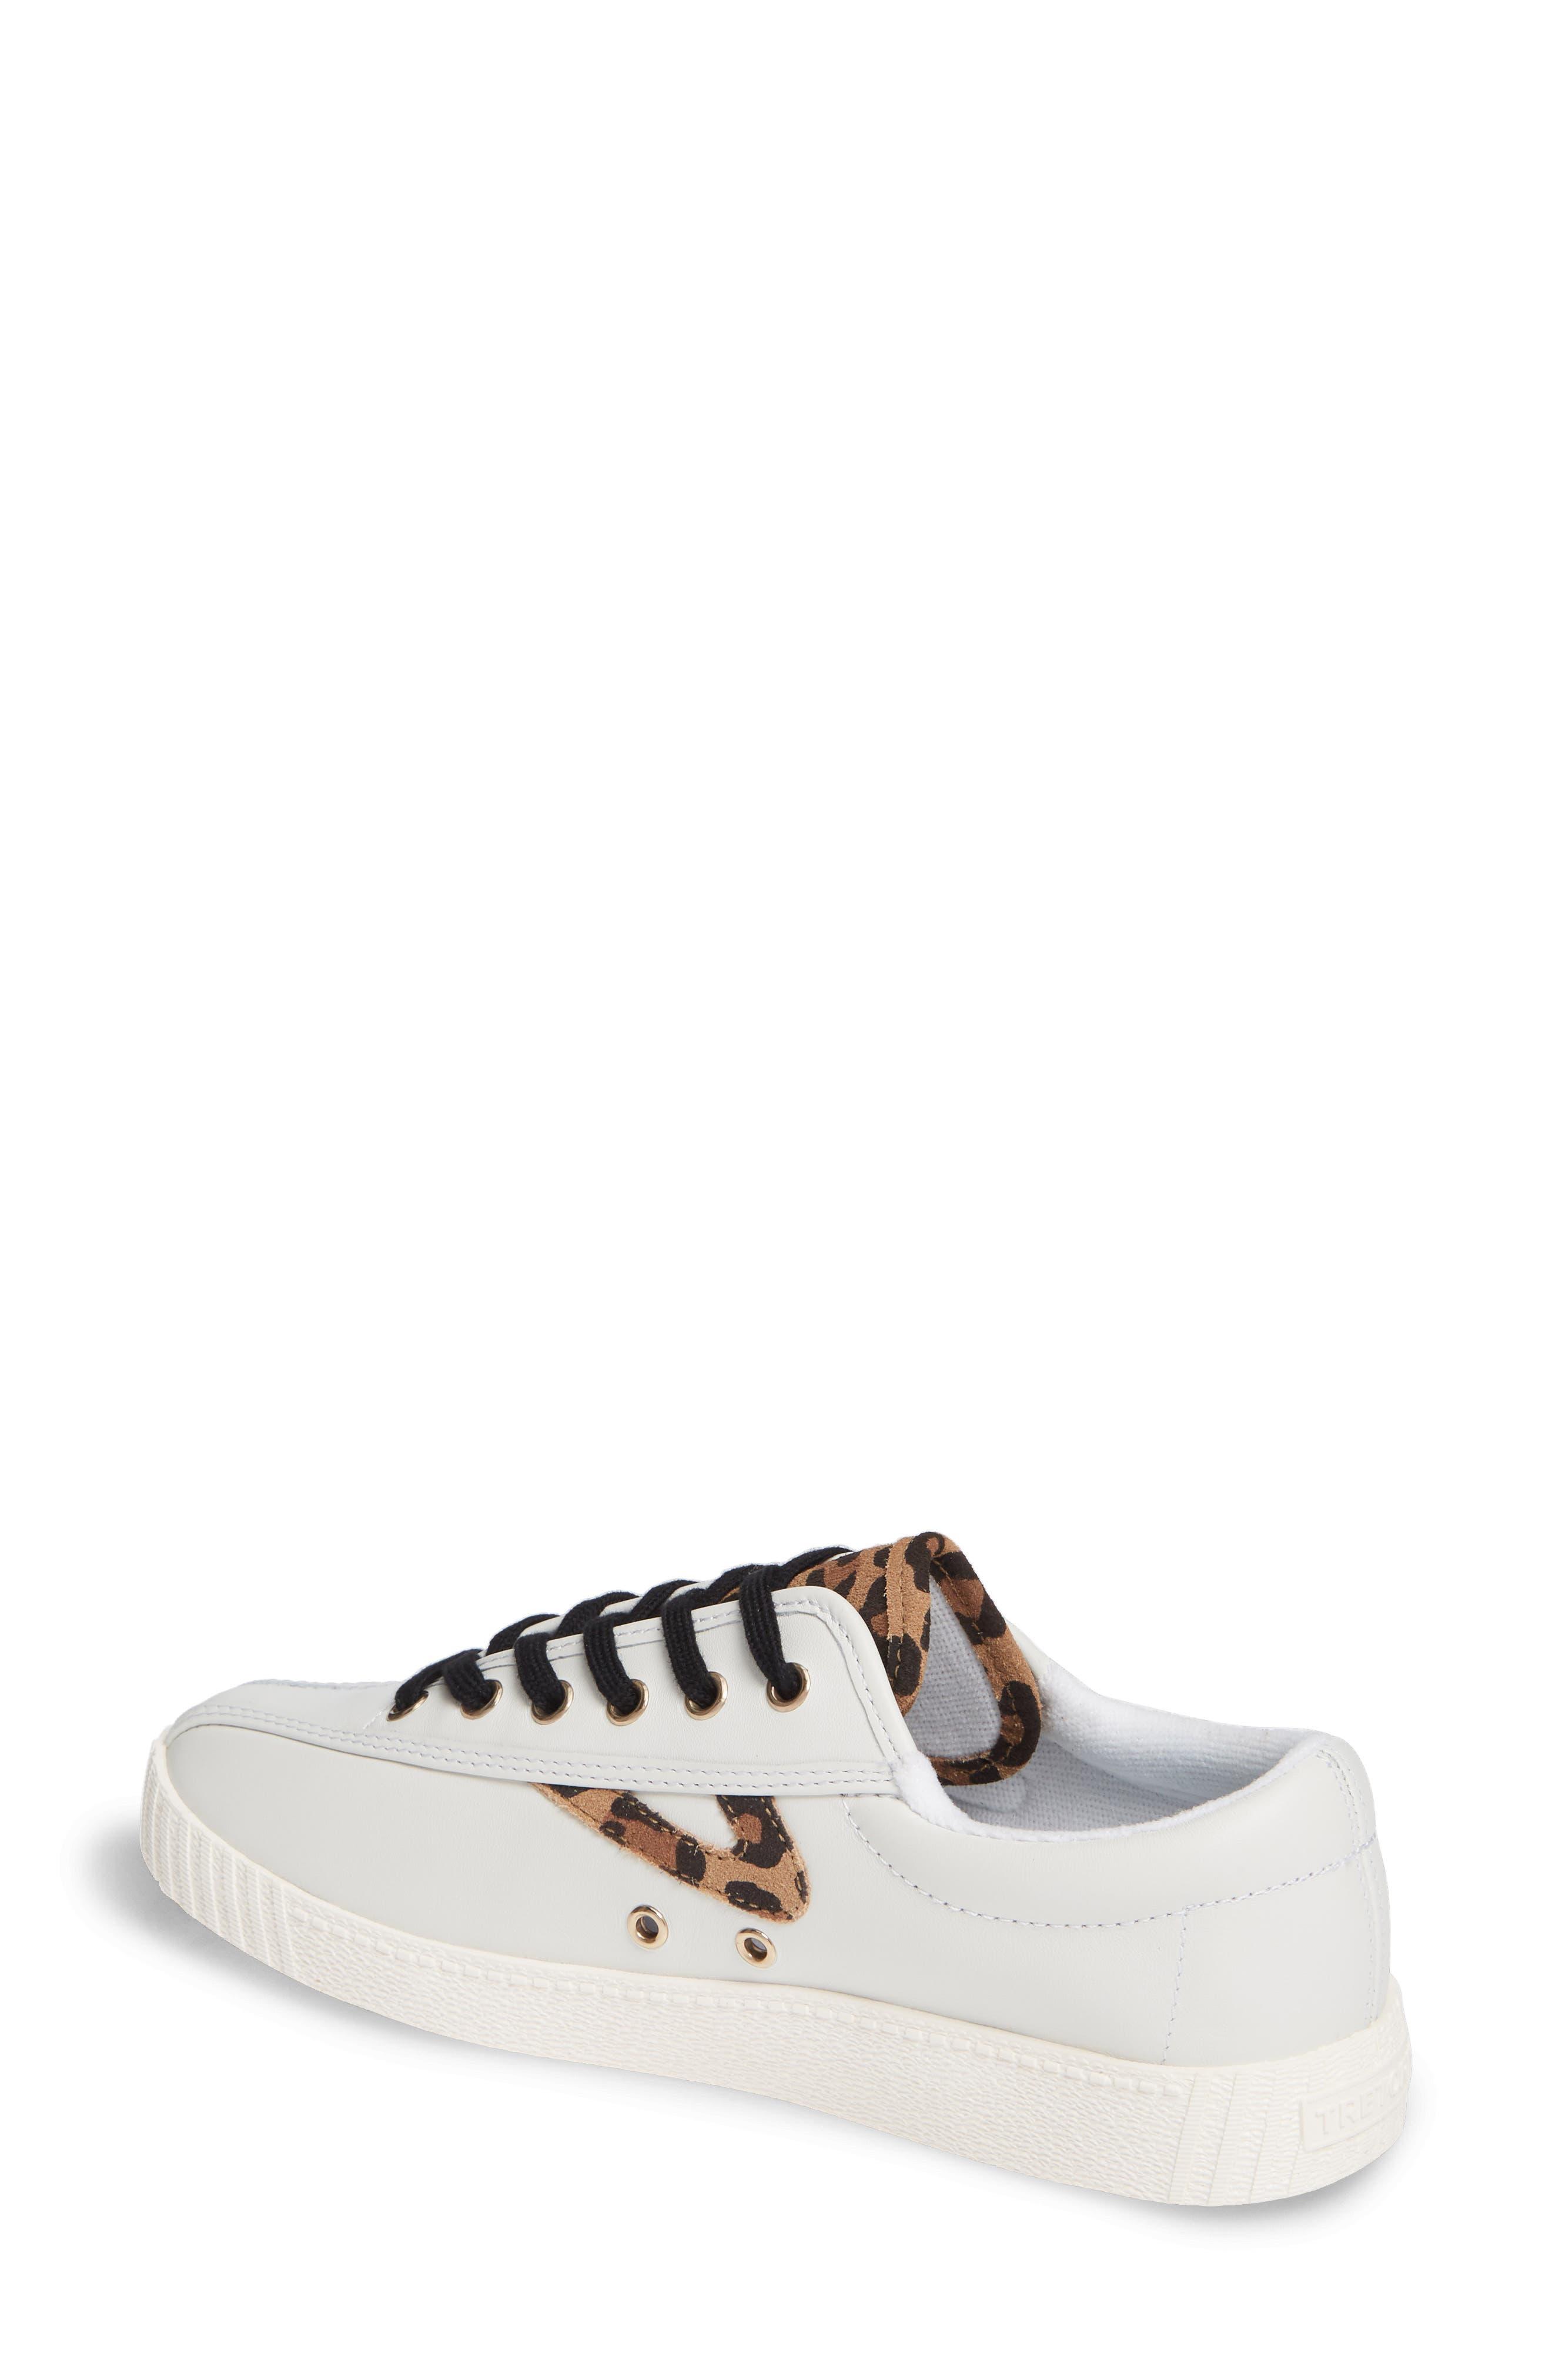 Patterned Sneaker,                             Alternate thumbnail 2, color,                             Vintage White/ Tan Multi